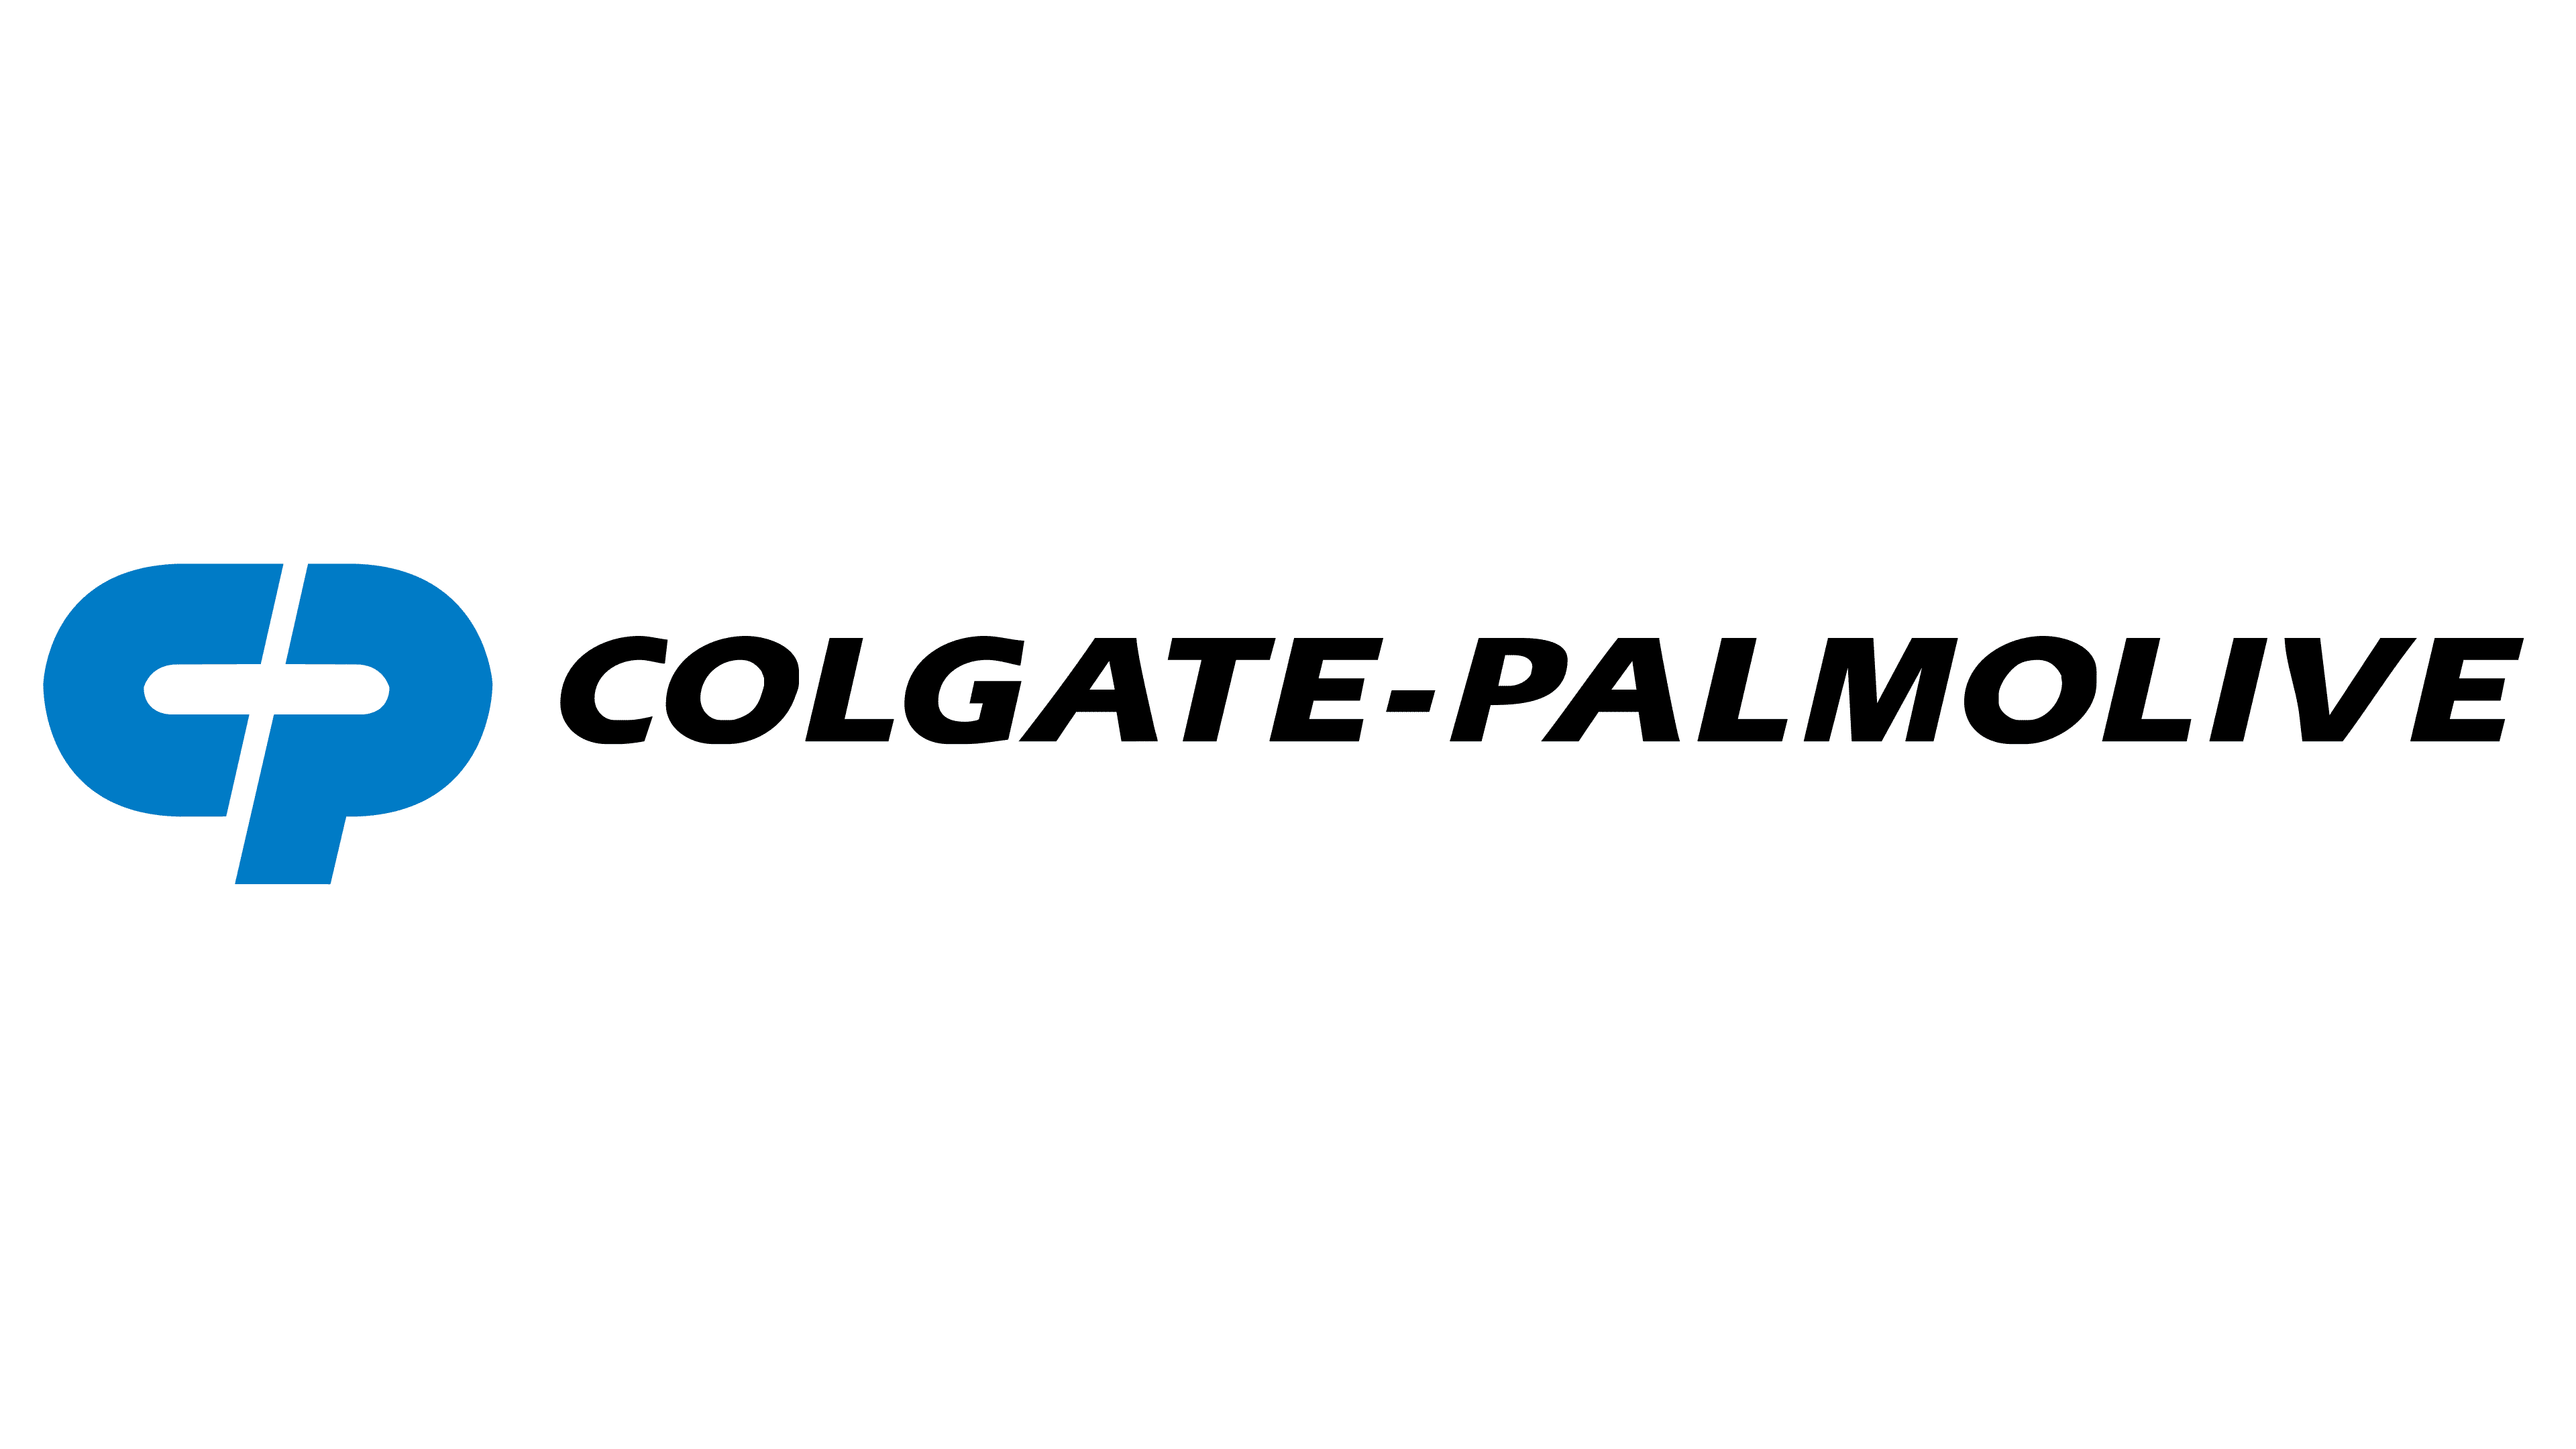 Colgate-Palmolive Logo | Symbol, History, PNG (3840*2160)